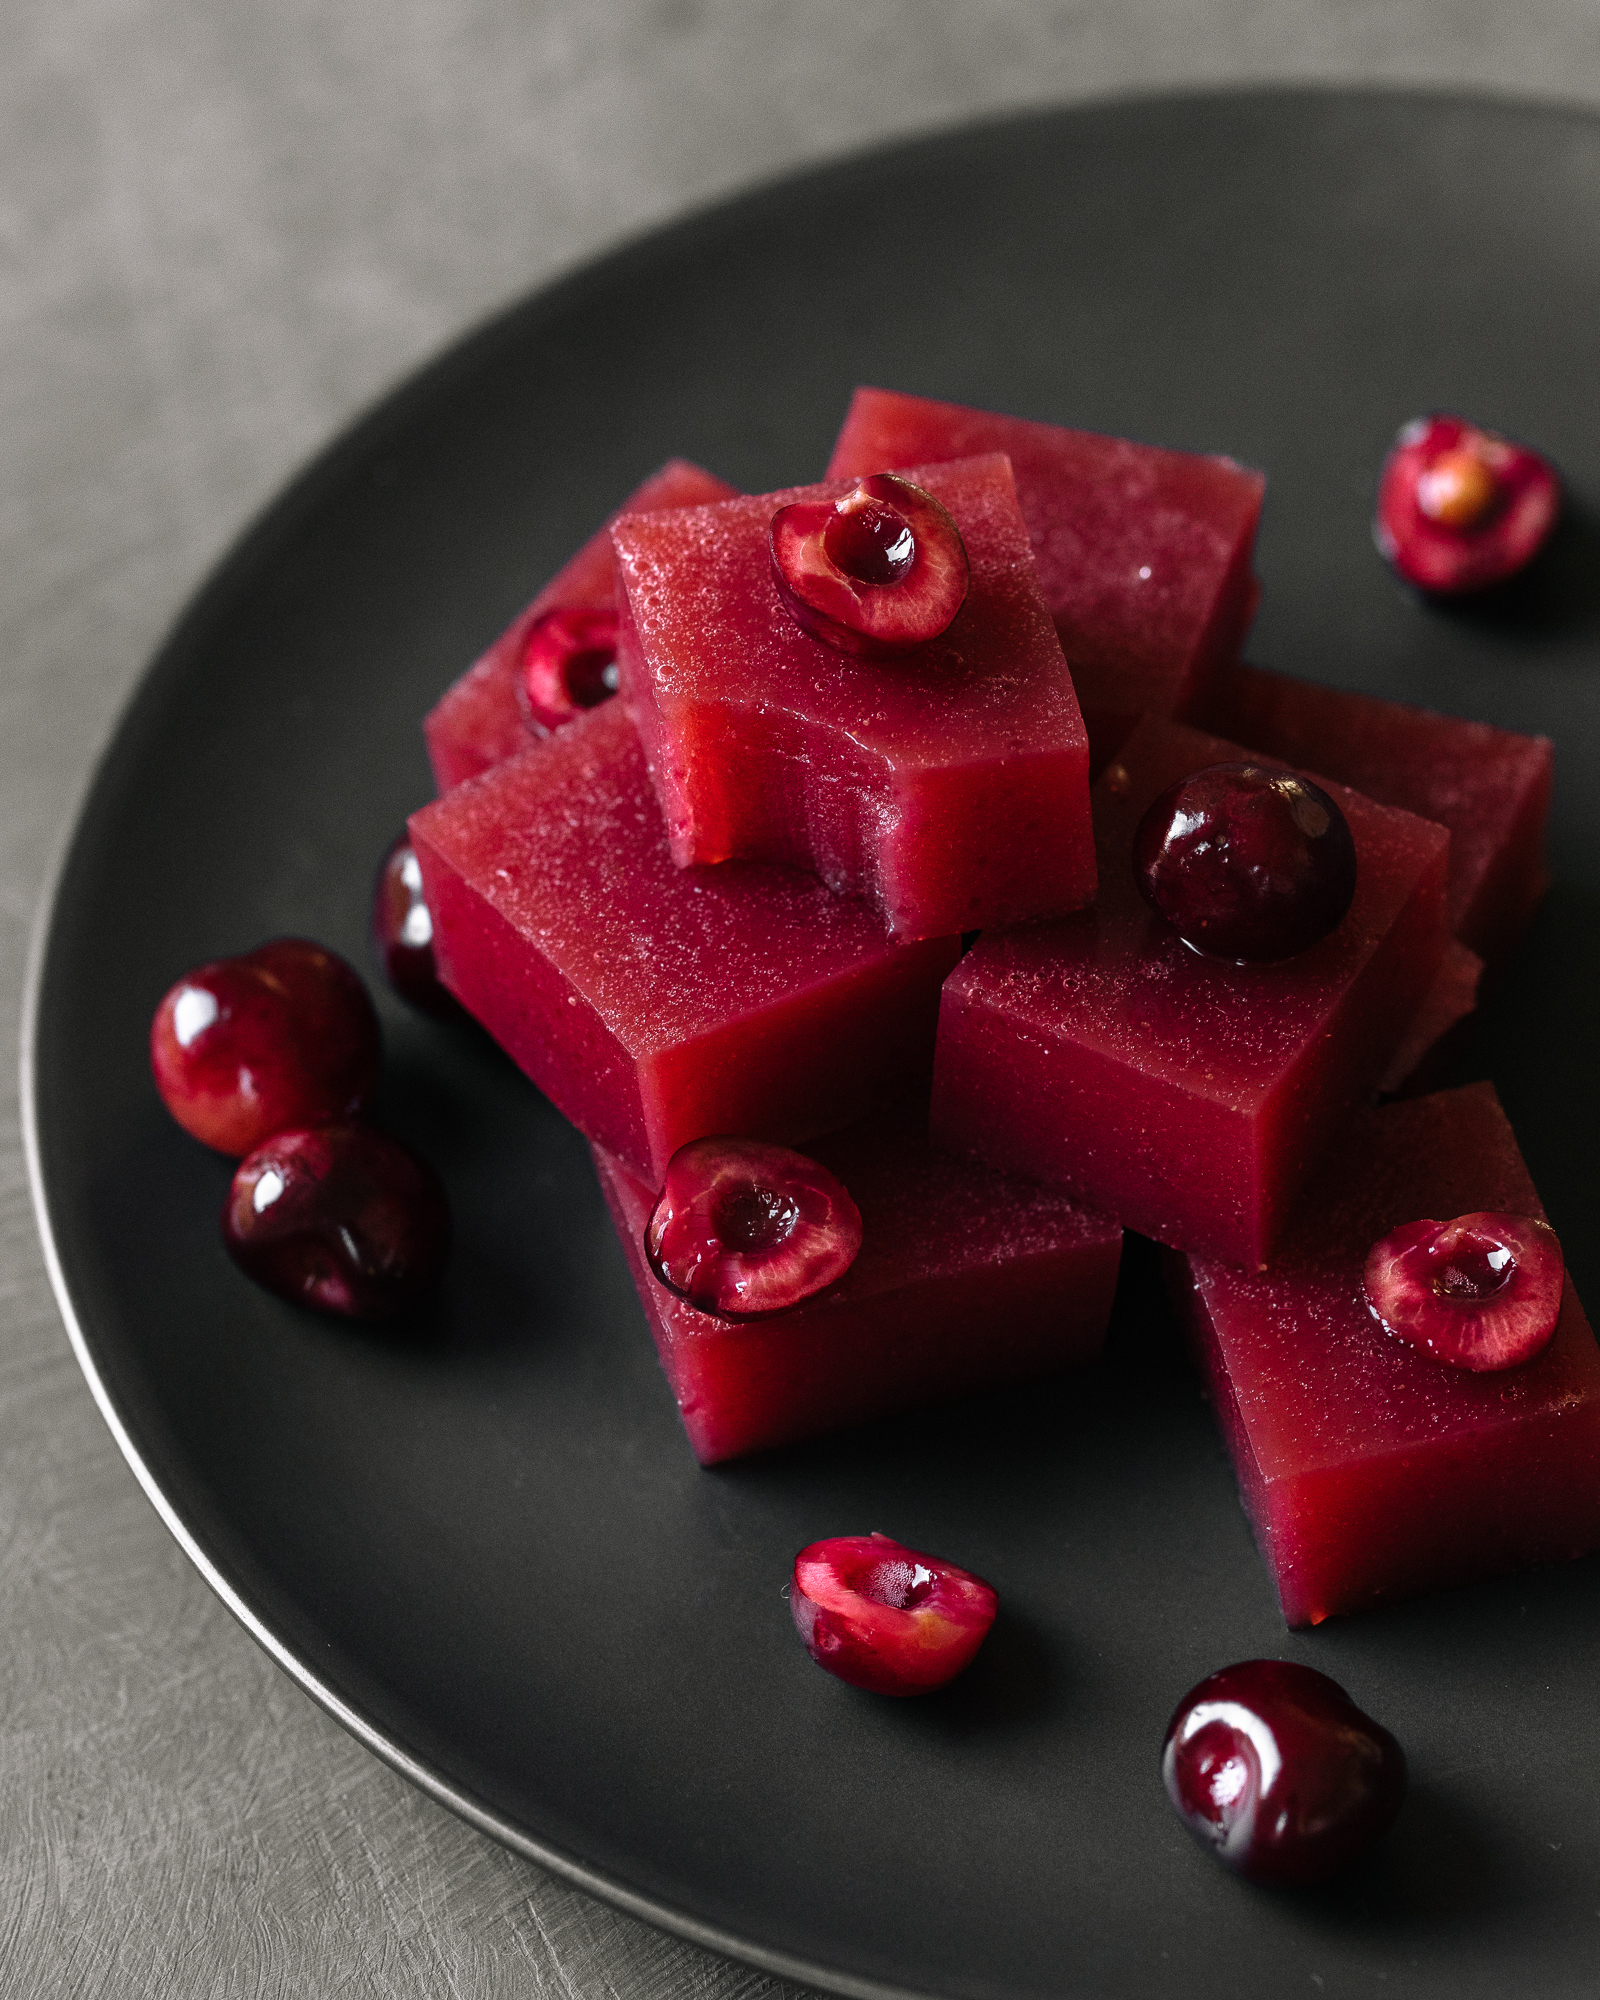 Cherry_and_Vanilla_Jellies_by_Jordan_Pie_Nutritionist_Real_Life_of_Pie-2.jpg